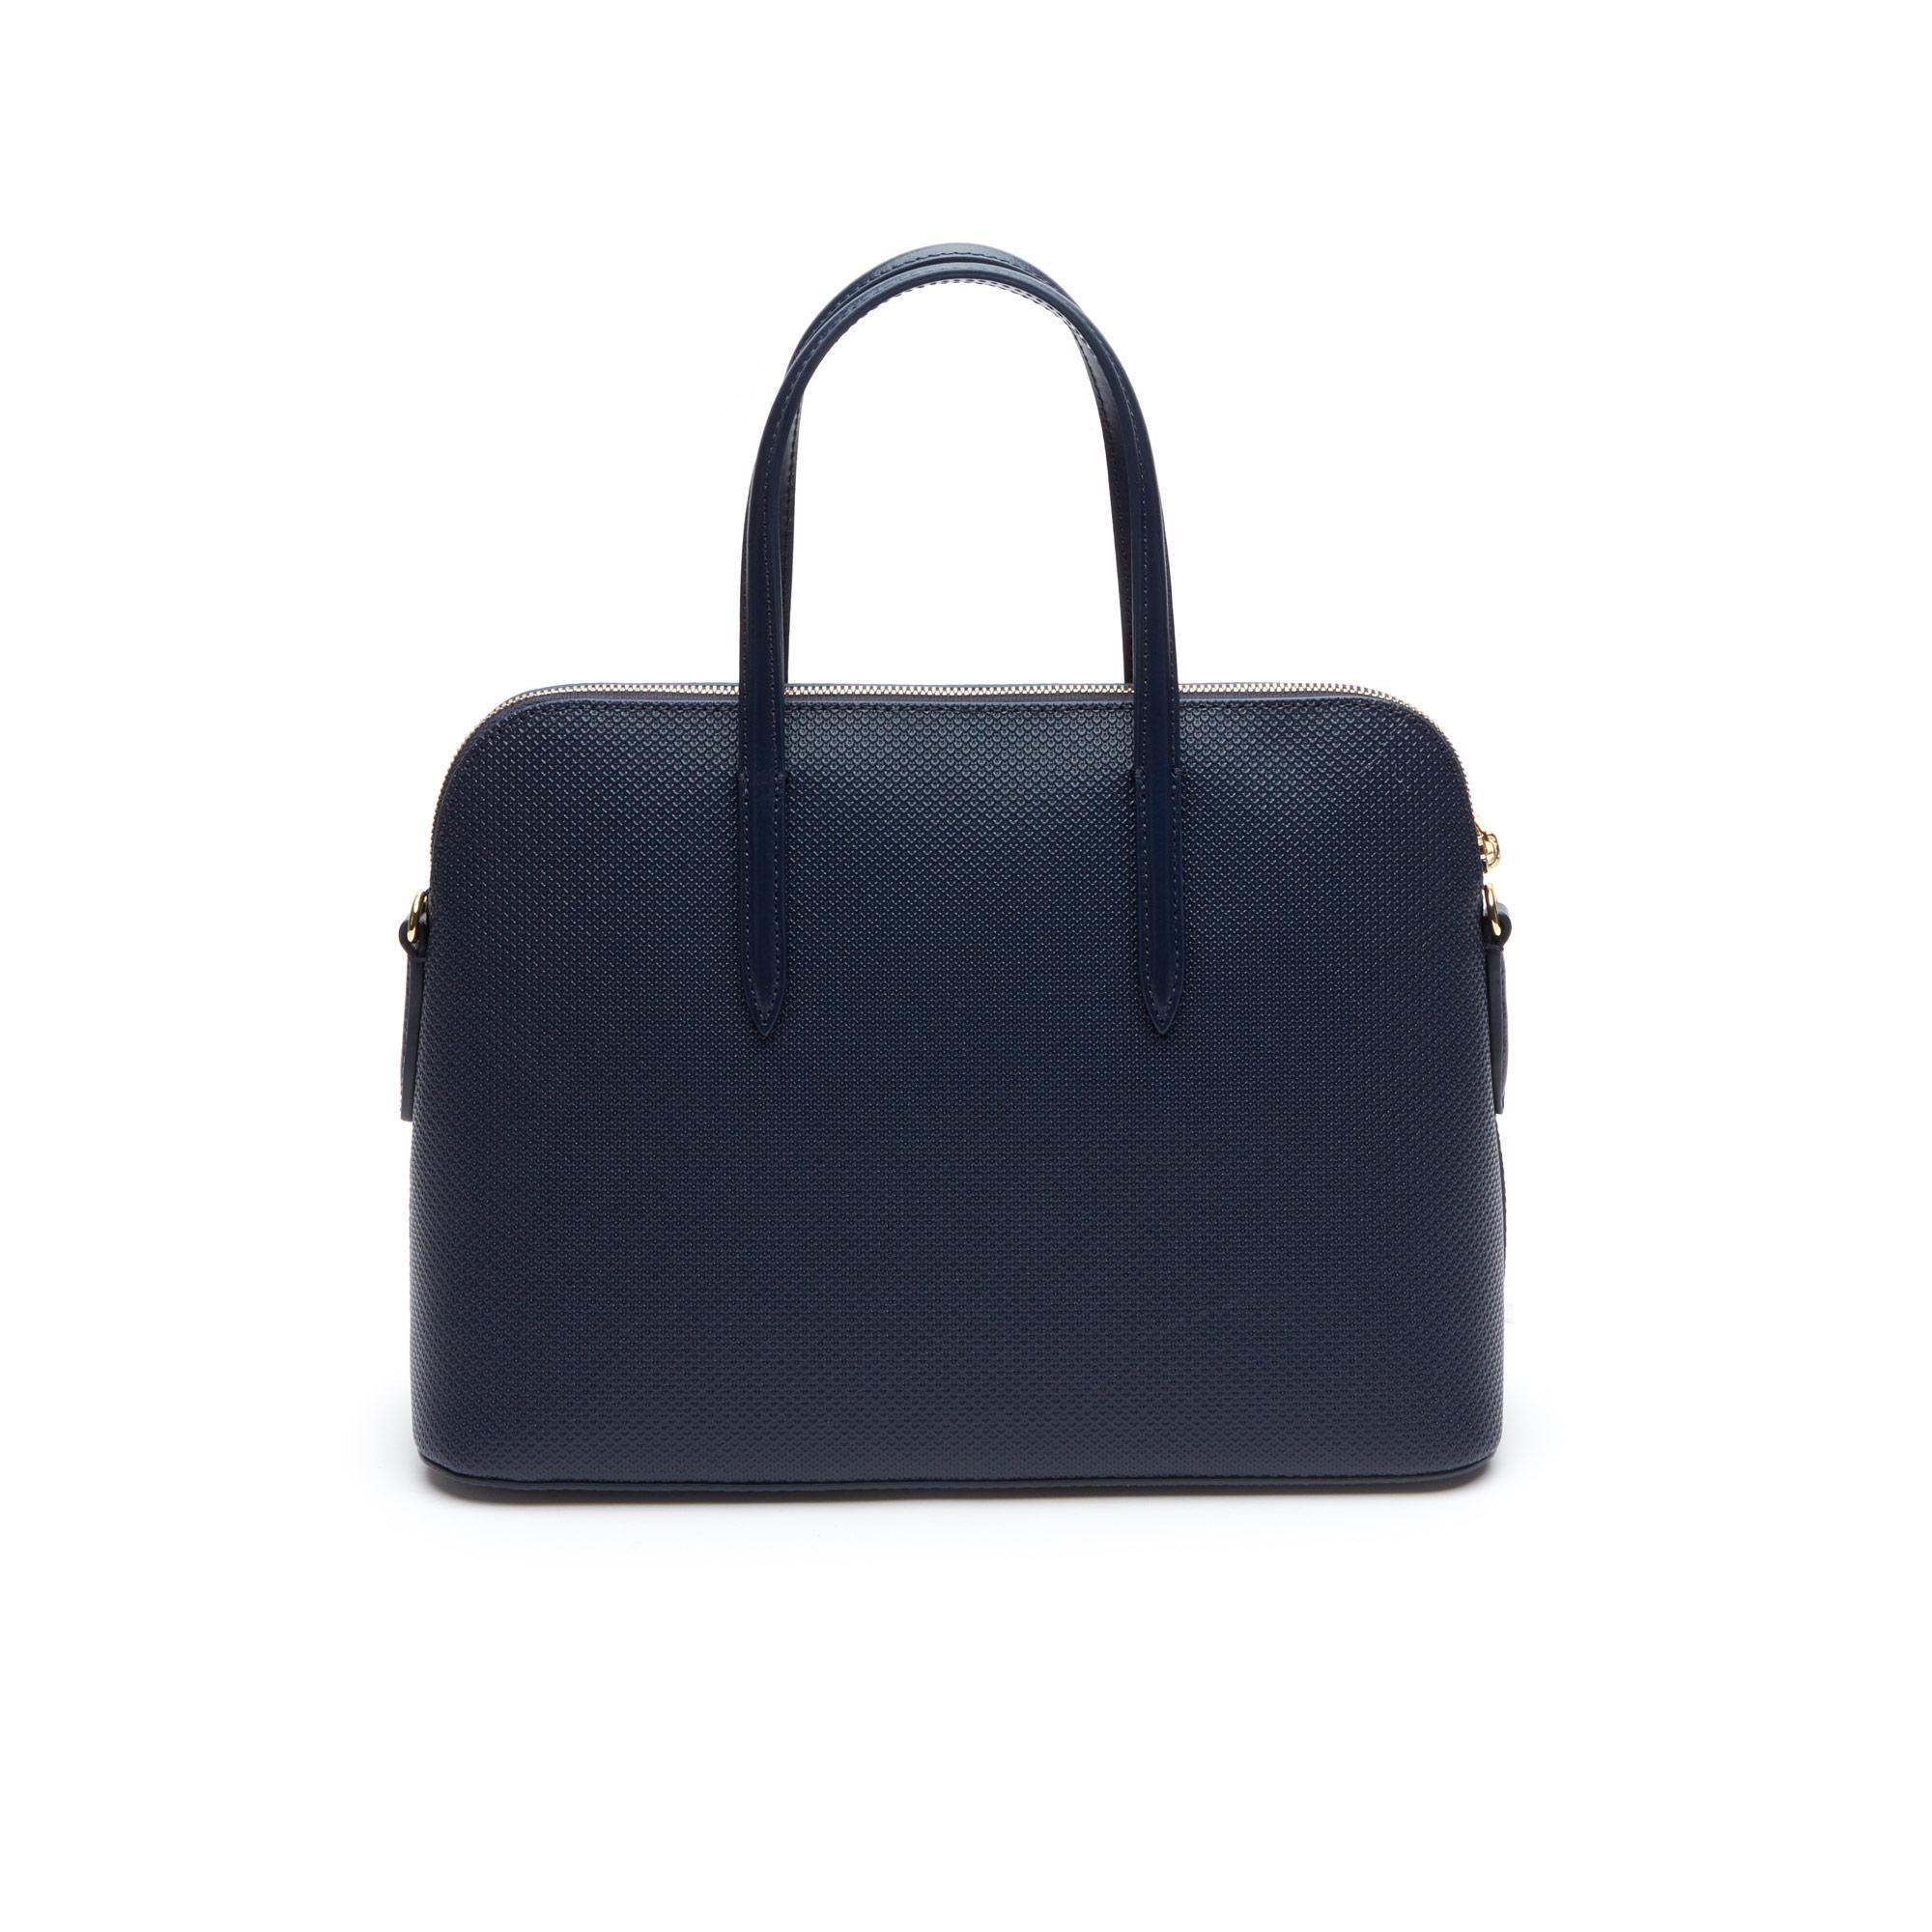 Lacoste Women's Chantaco Bag